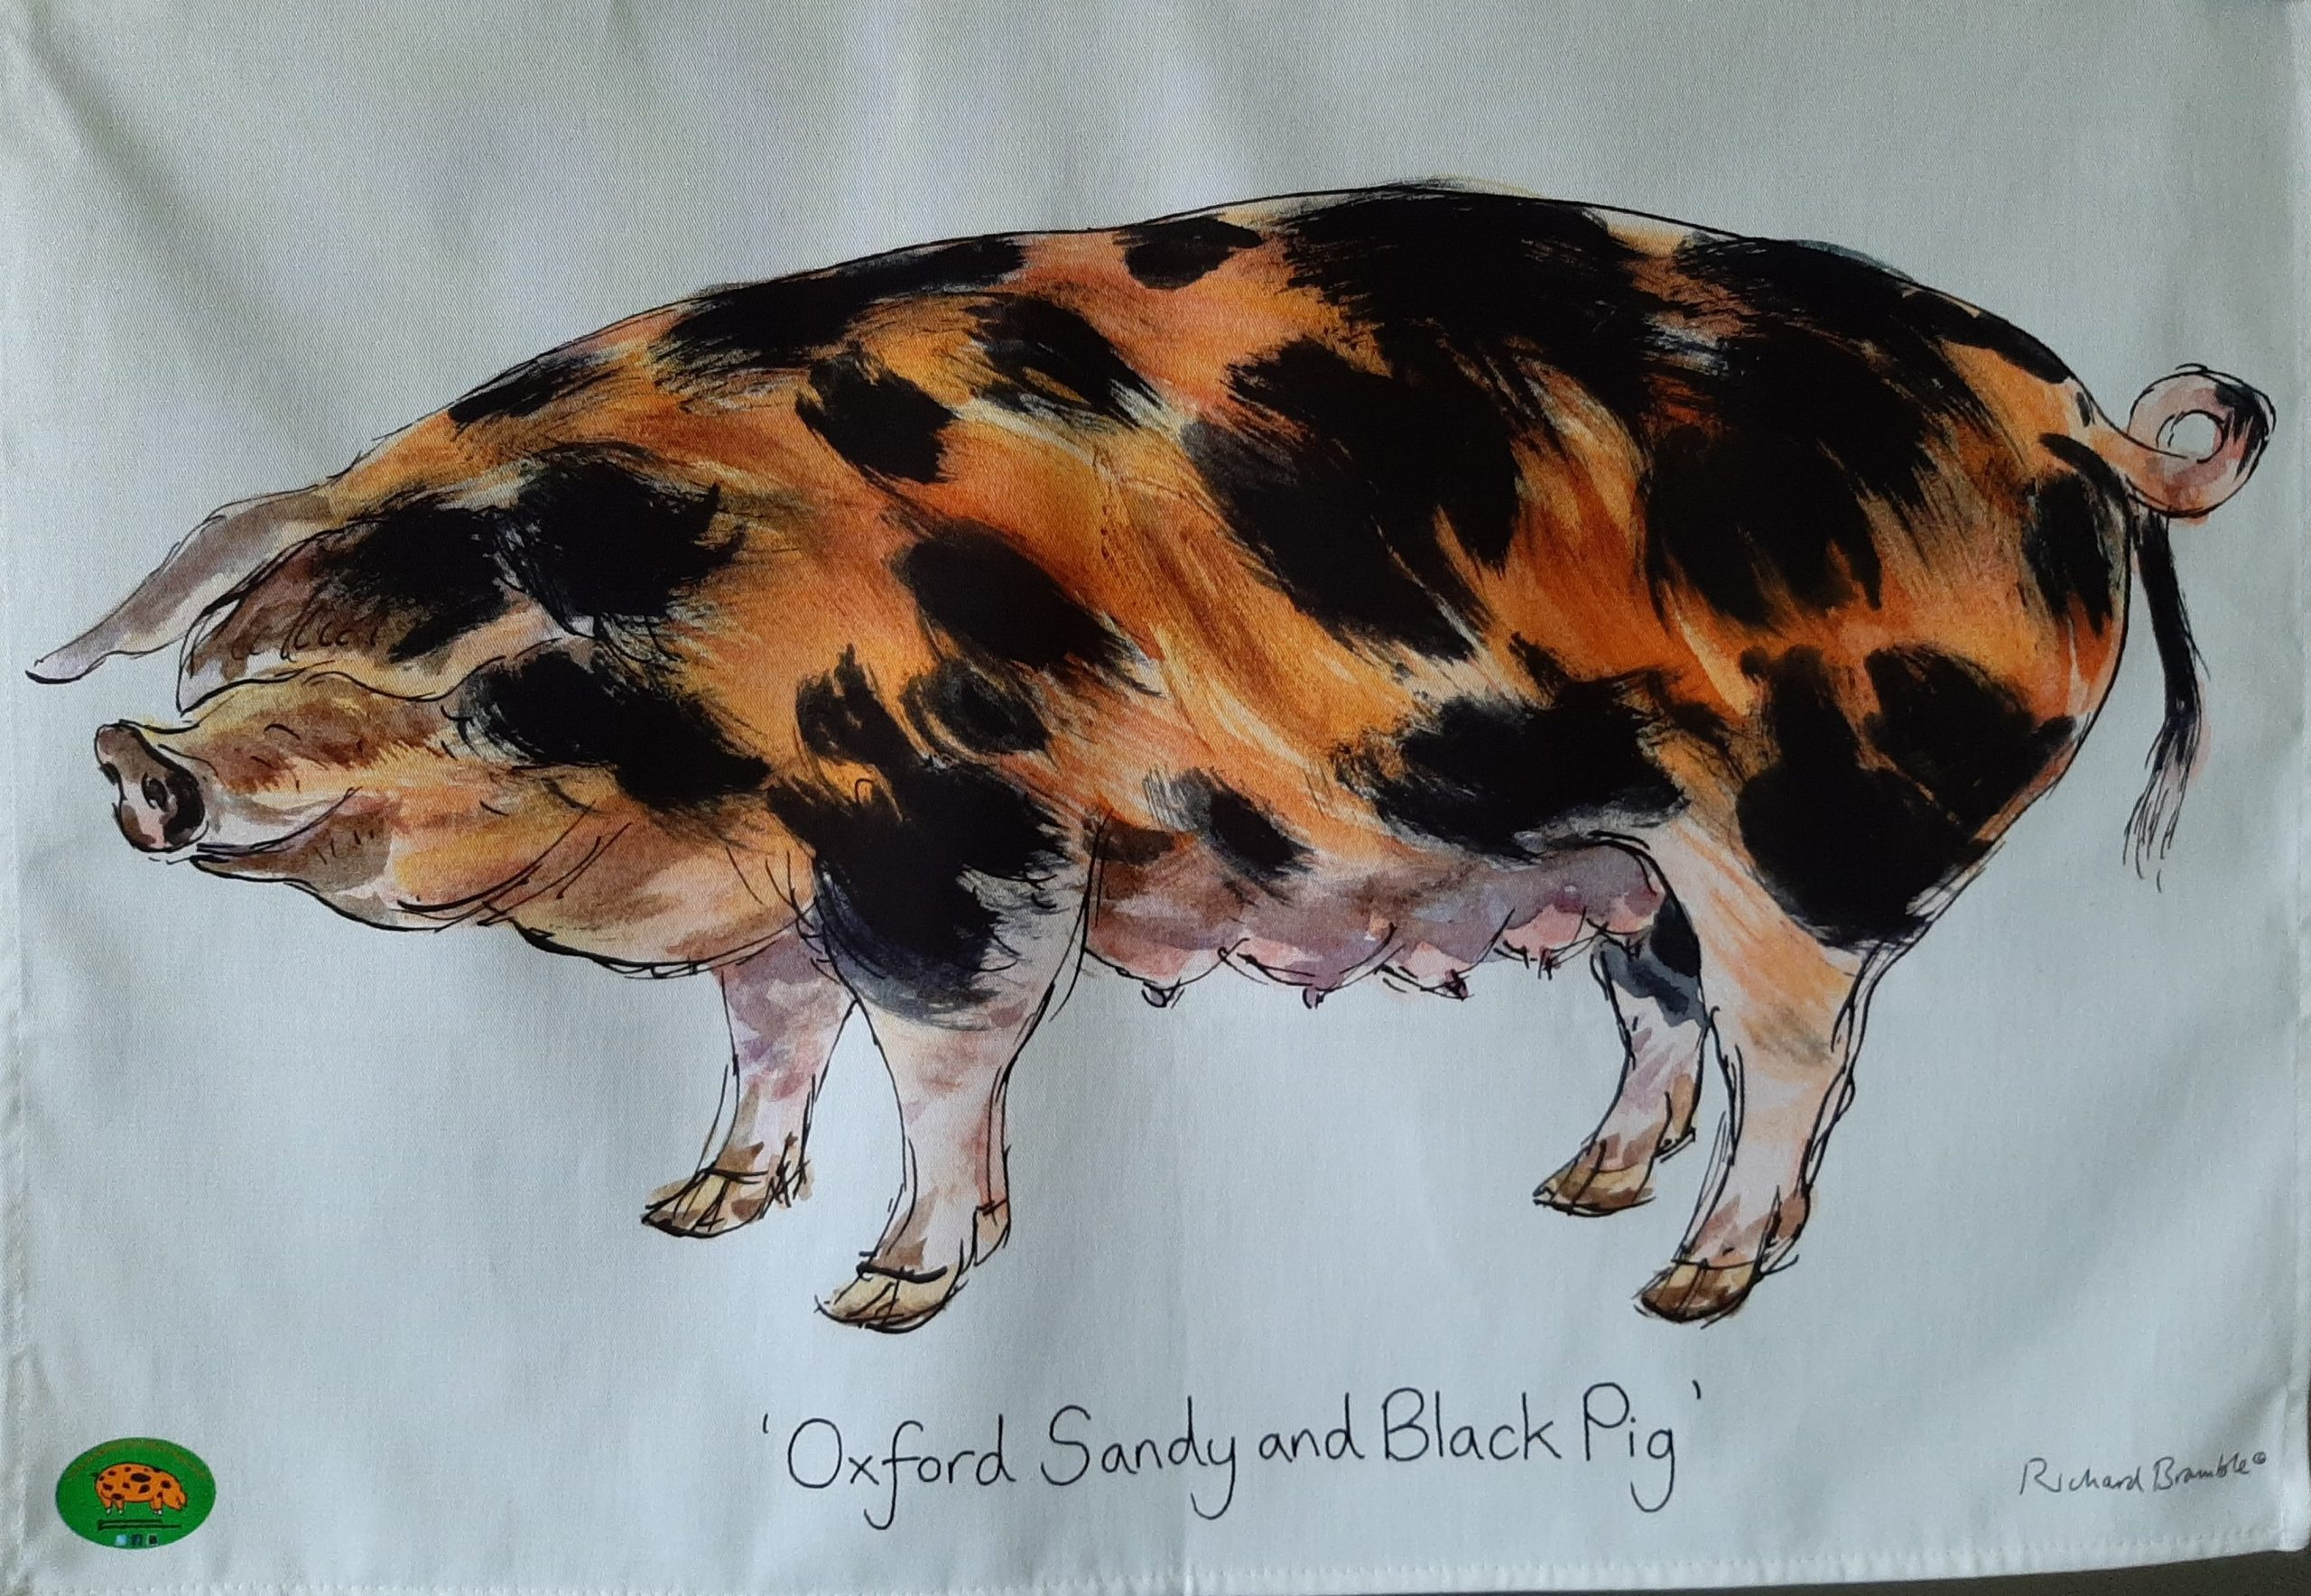 Oxford Sandy Black Pig Group Tea Towel